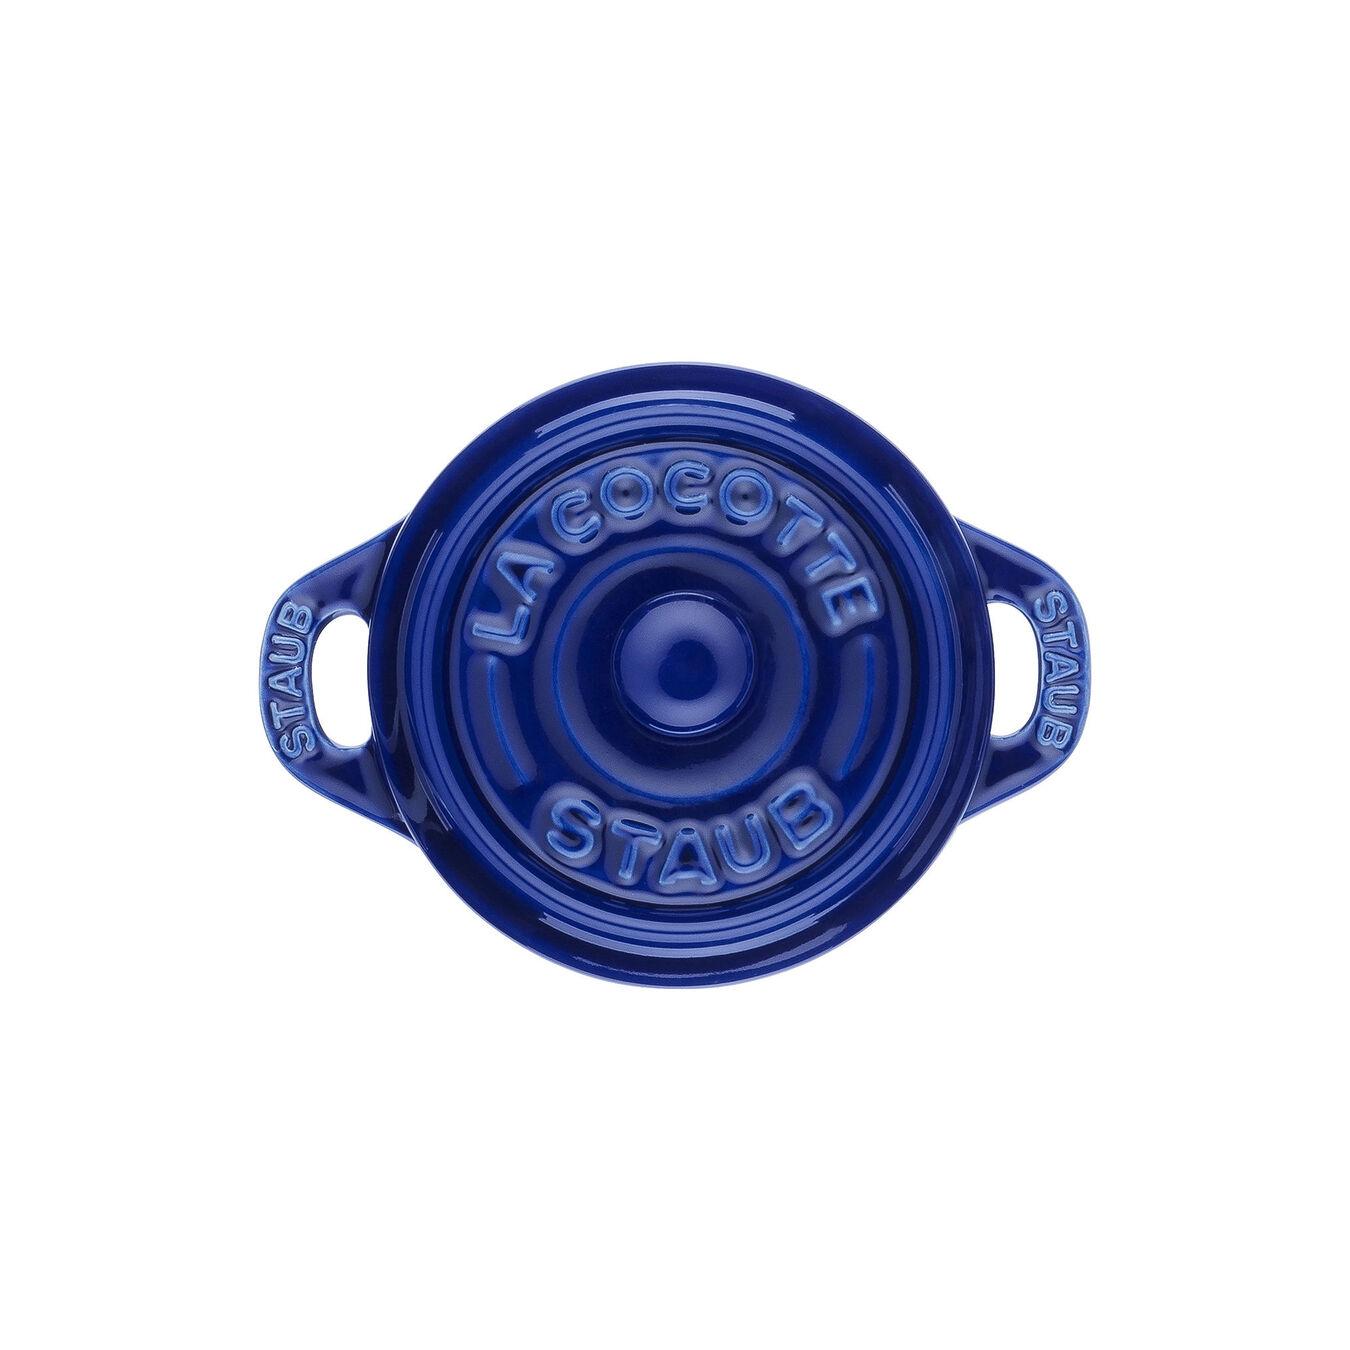 Mini Cocotte 10 cm, redondo, azul marinho, Cerâmica,,large 3